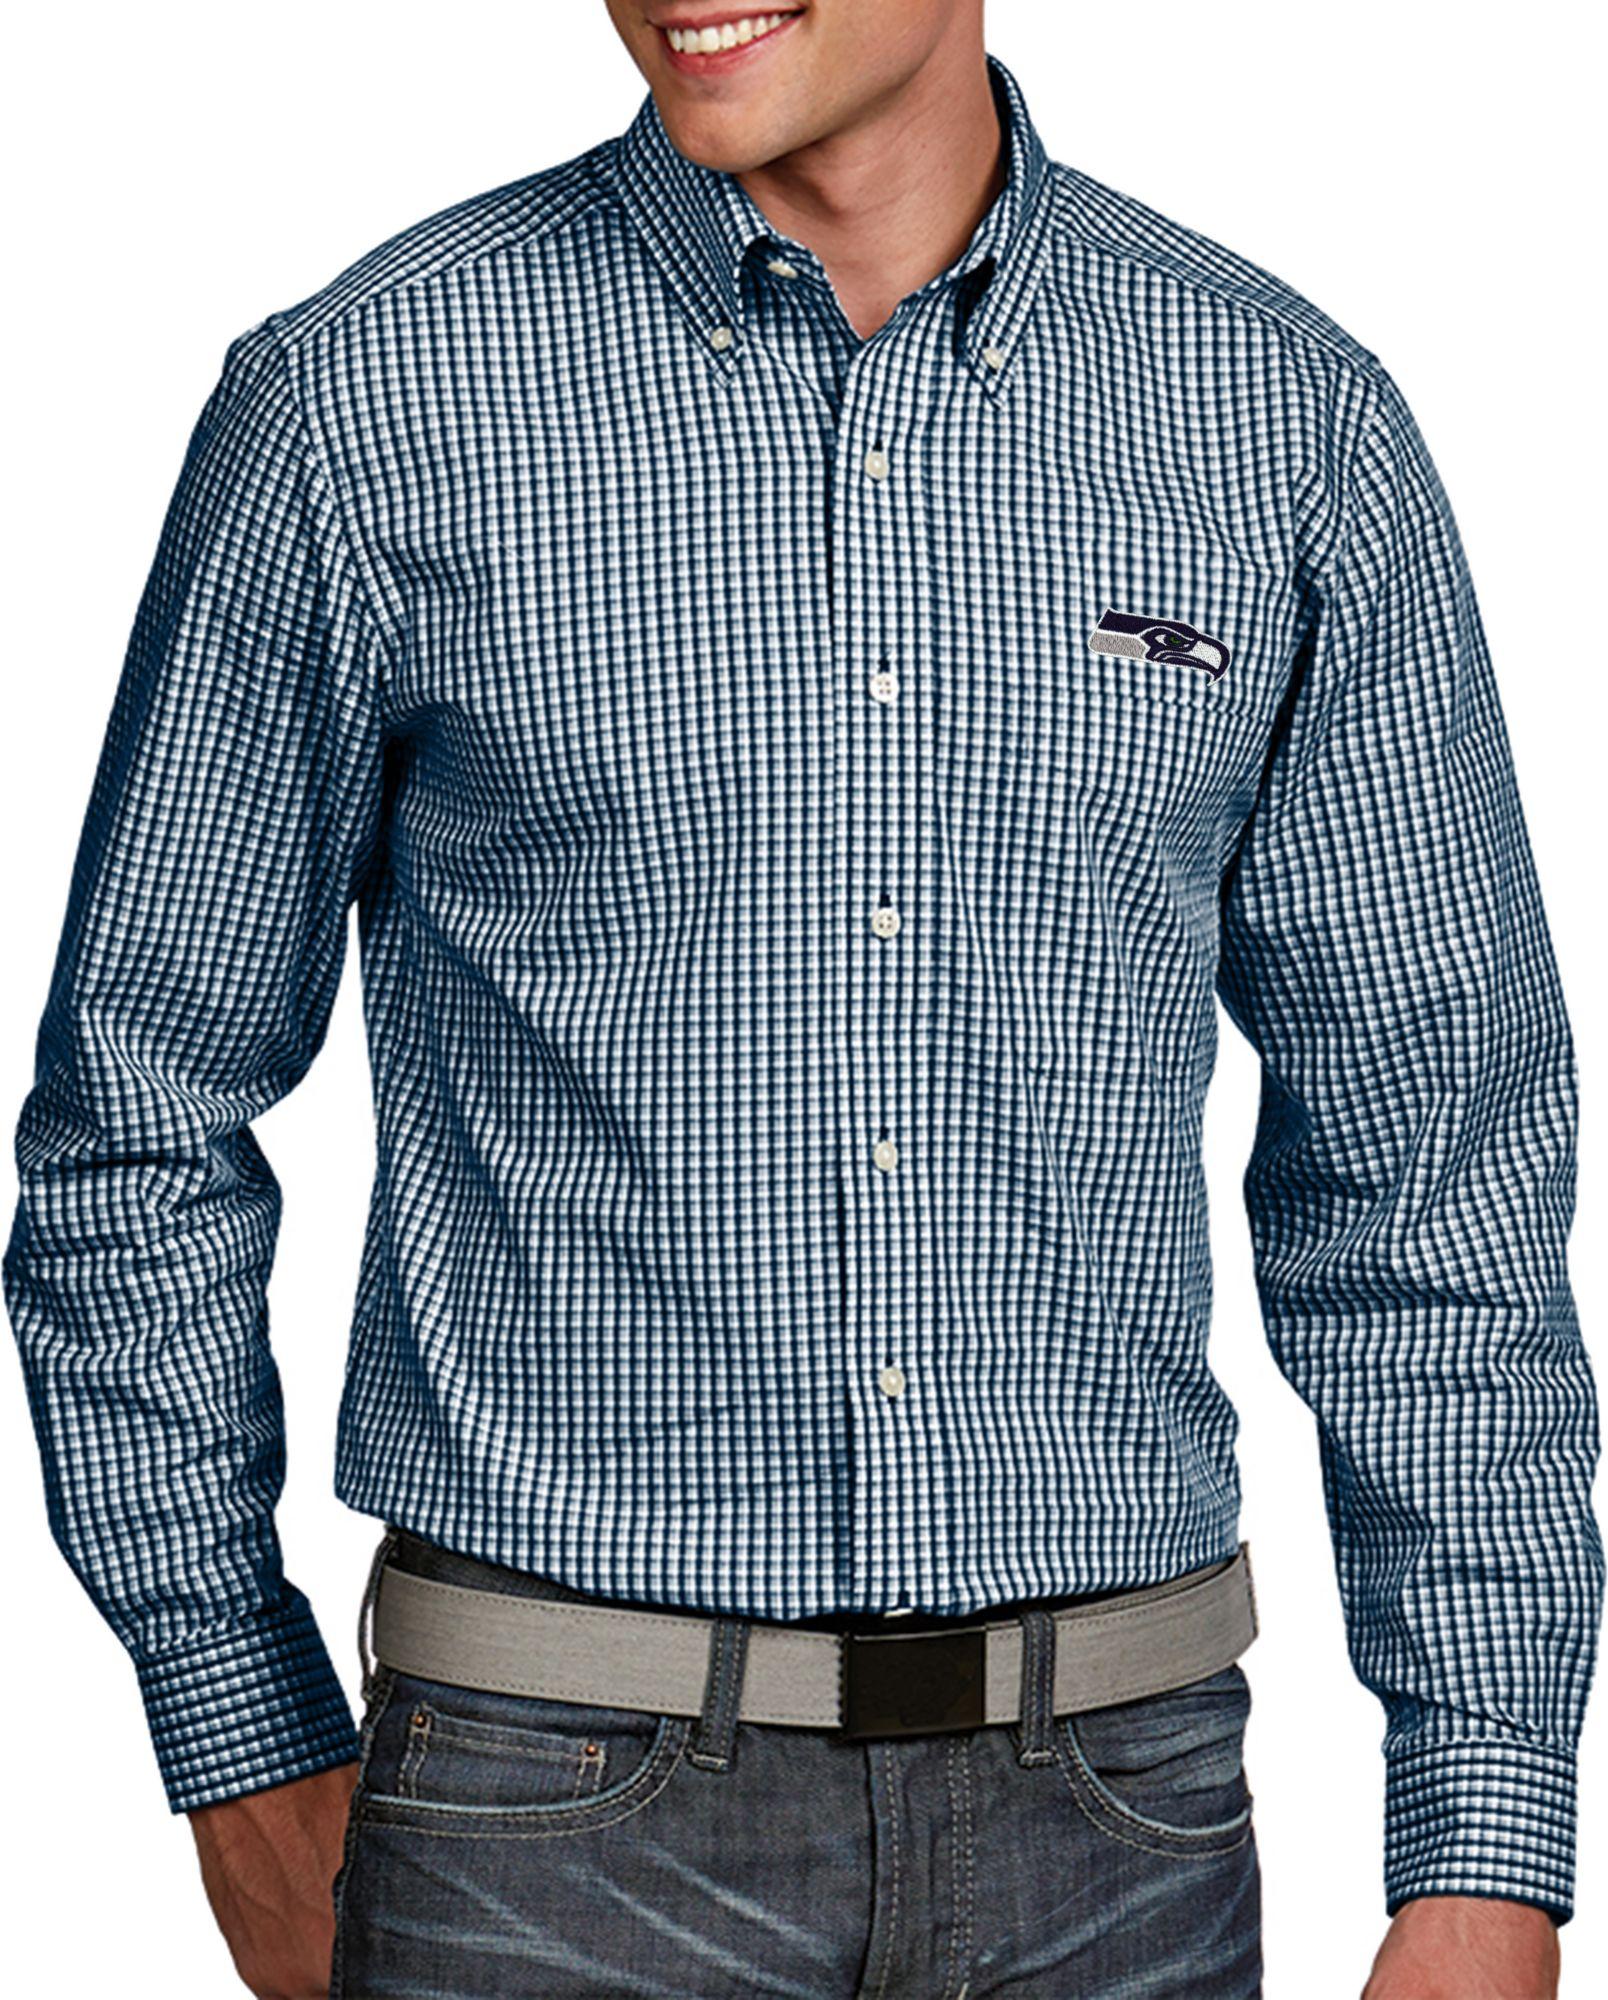 seattle seahawks dress shirt